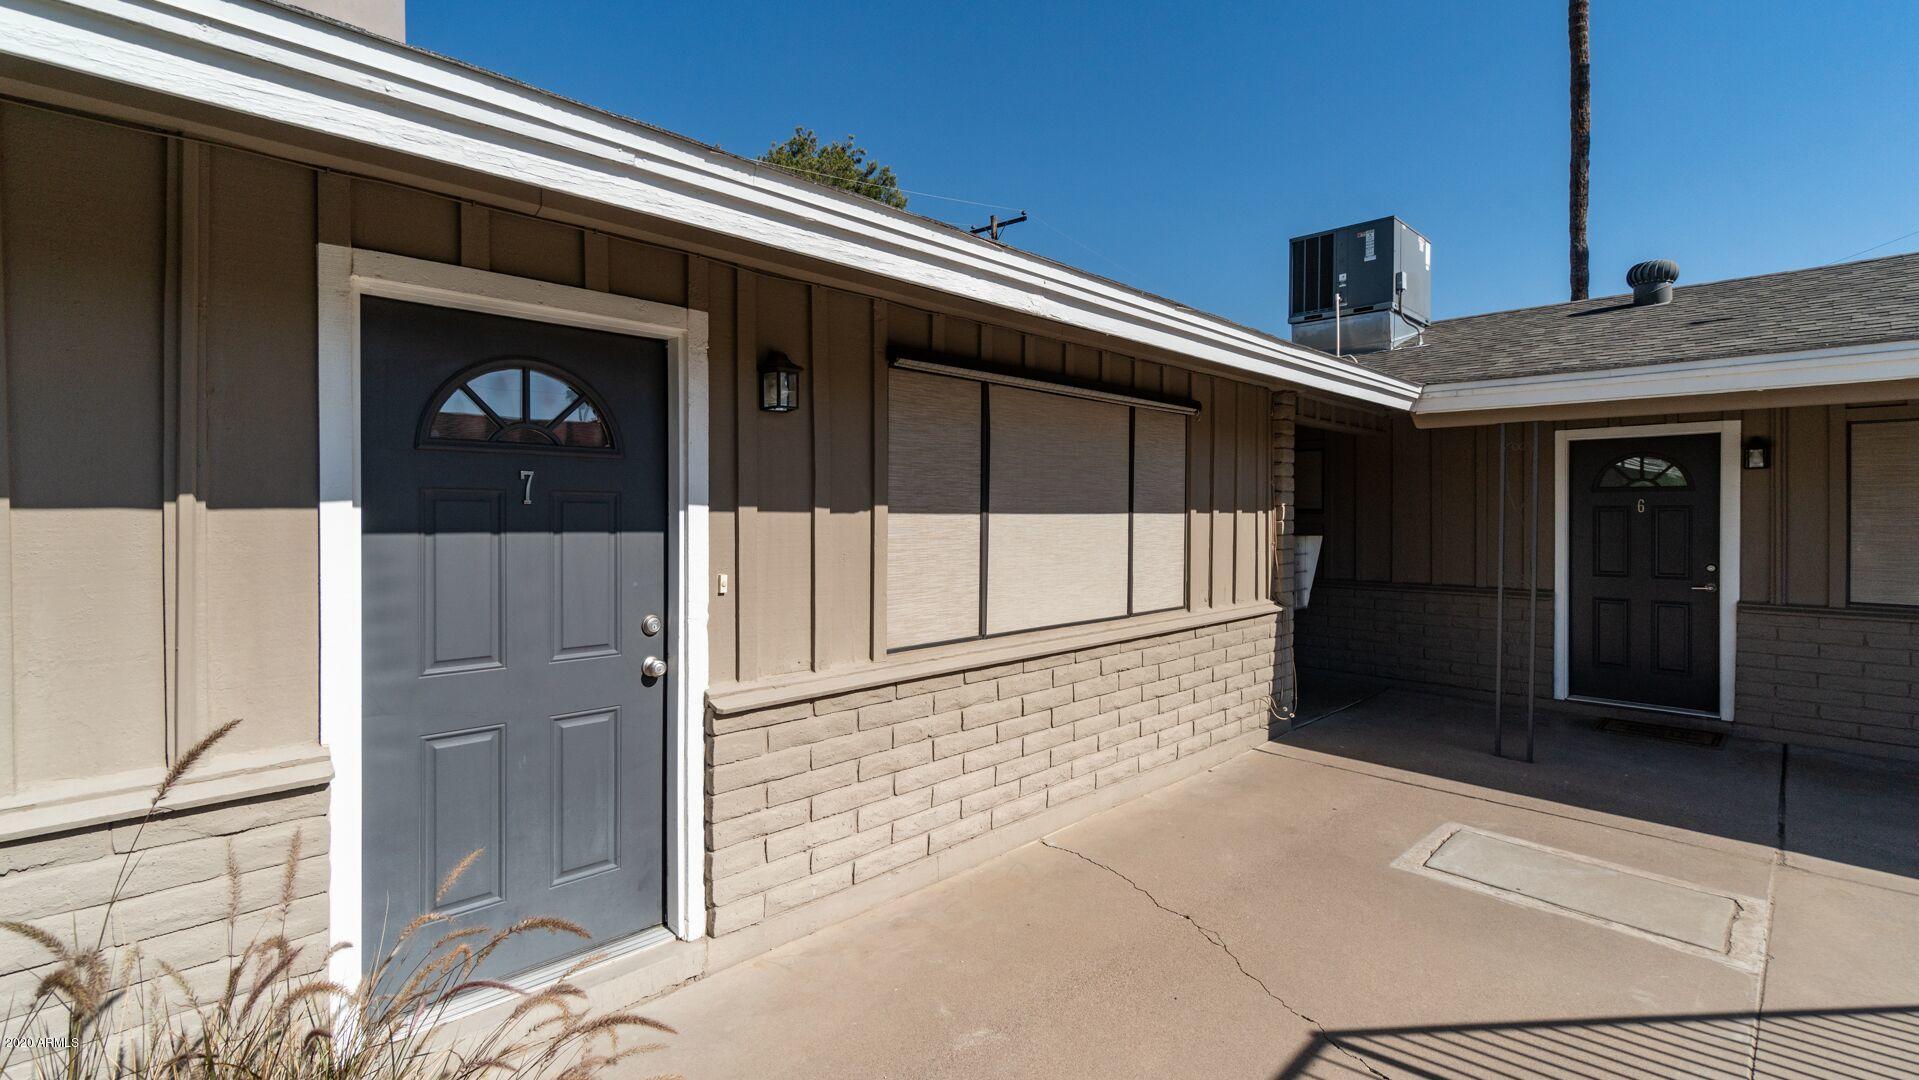 Photo of 2525 S COLLEGE Avenue #7, Tempe, AZ 85282